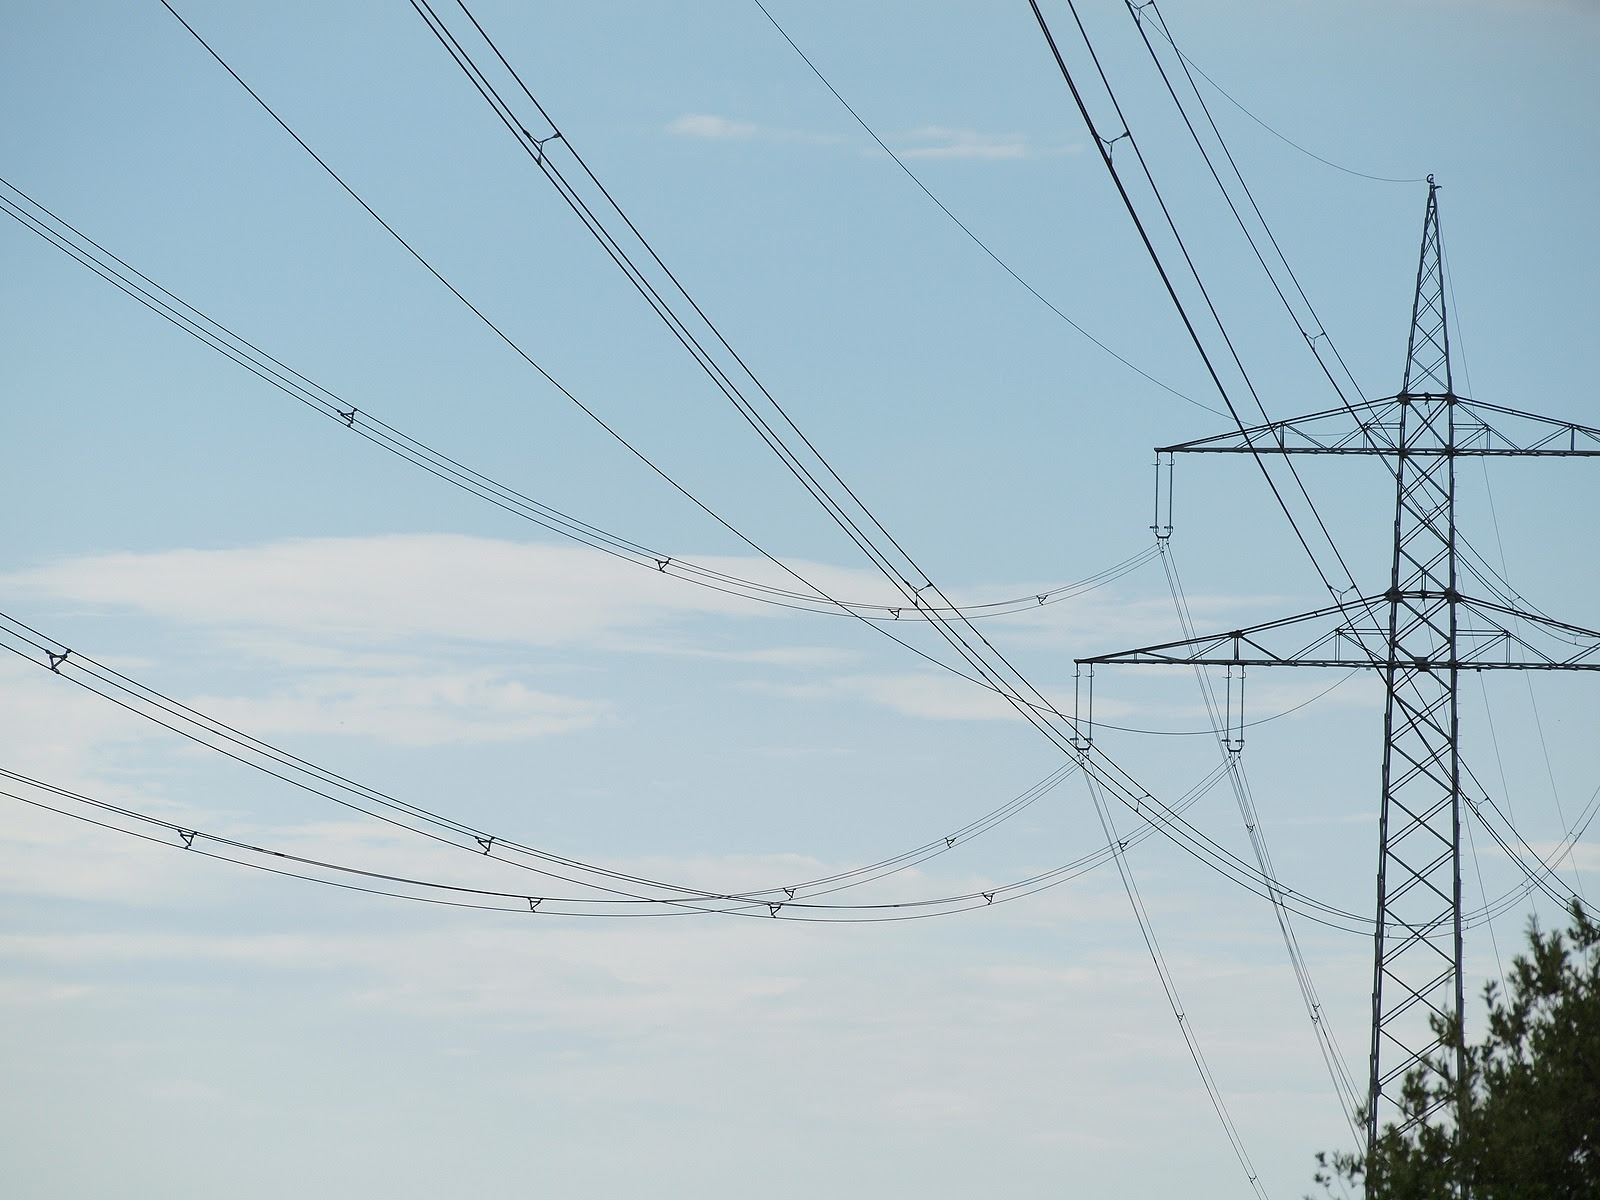 Línea eléctrica